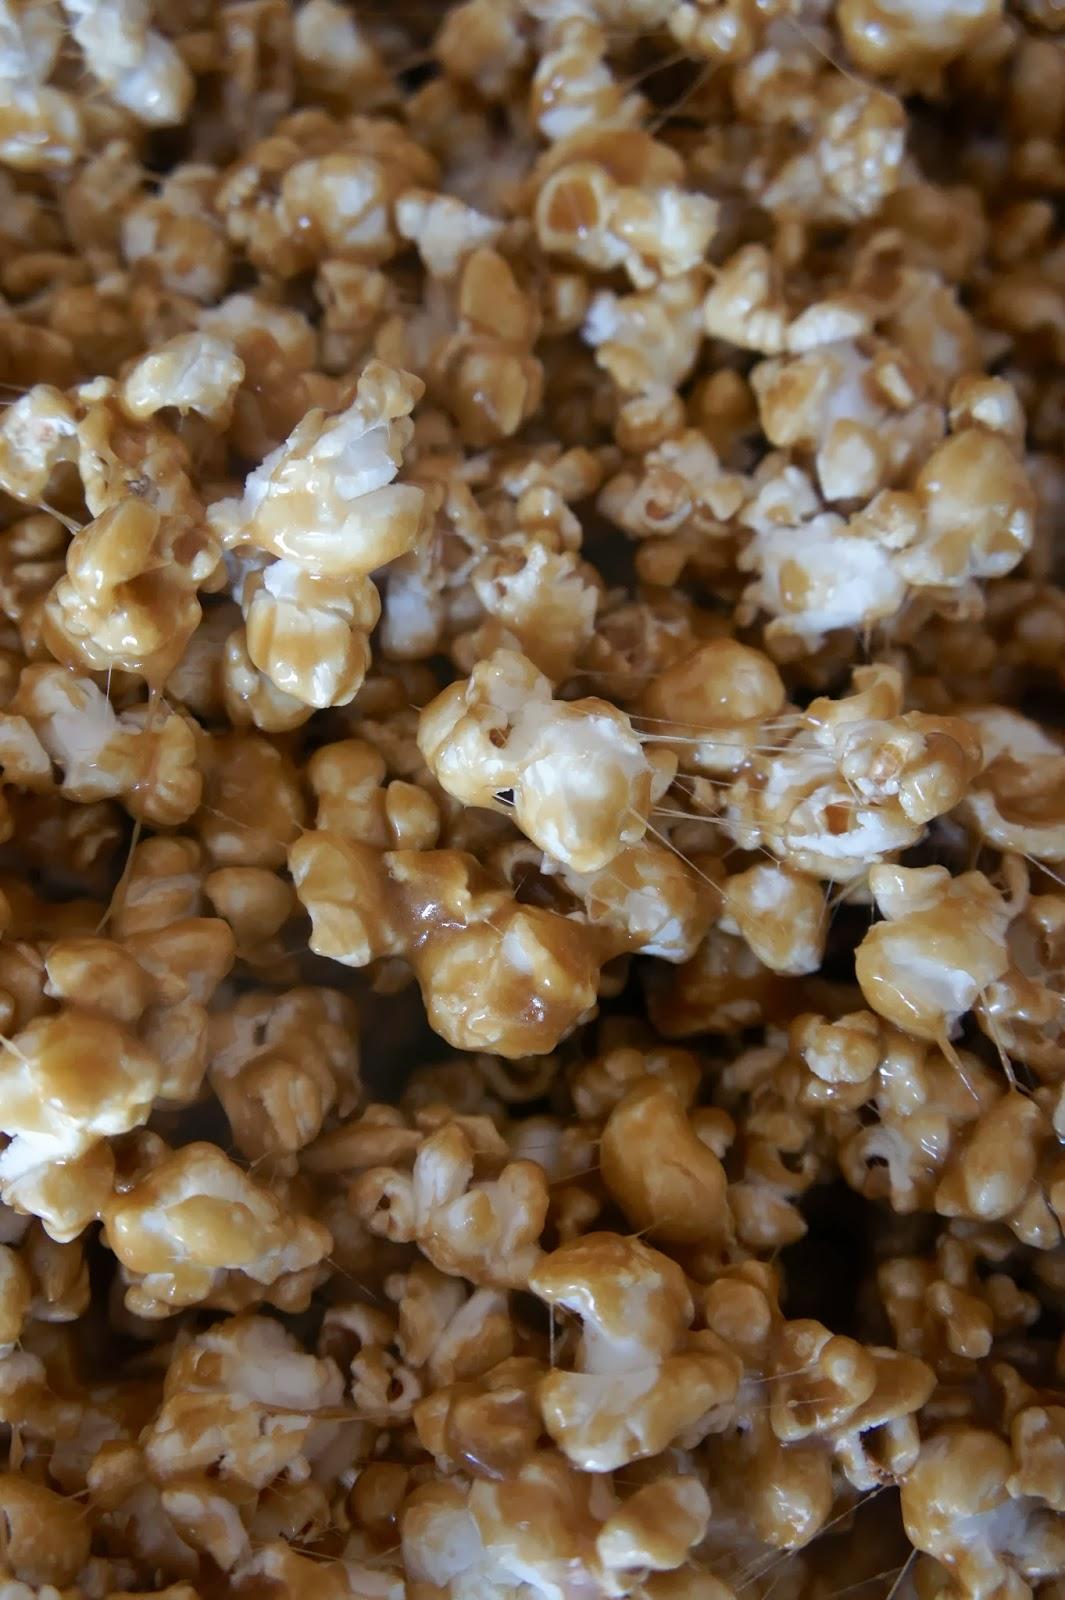 Savory Sweet and Satisfying: Caramel Marshmallow Popcorn